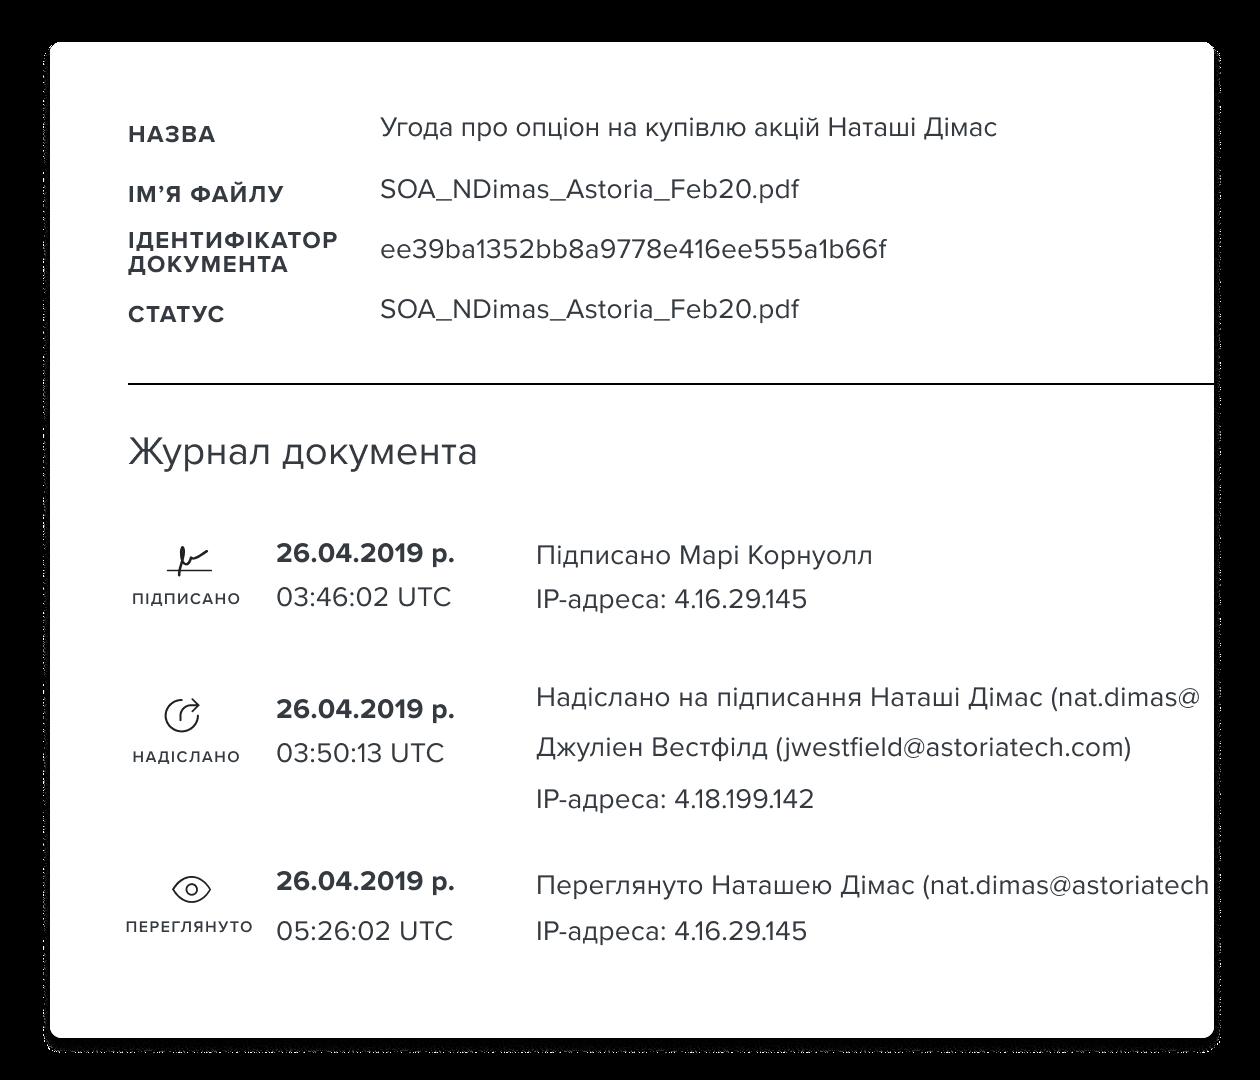 Скріншот журналу документів у HelloSign